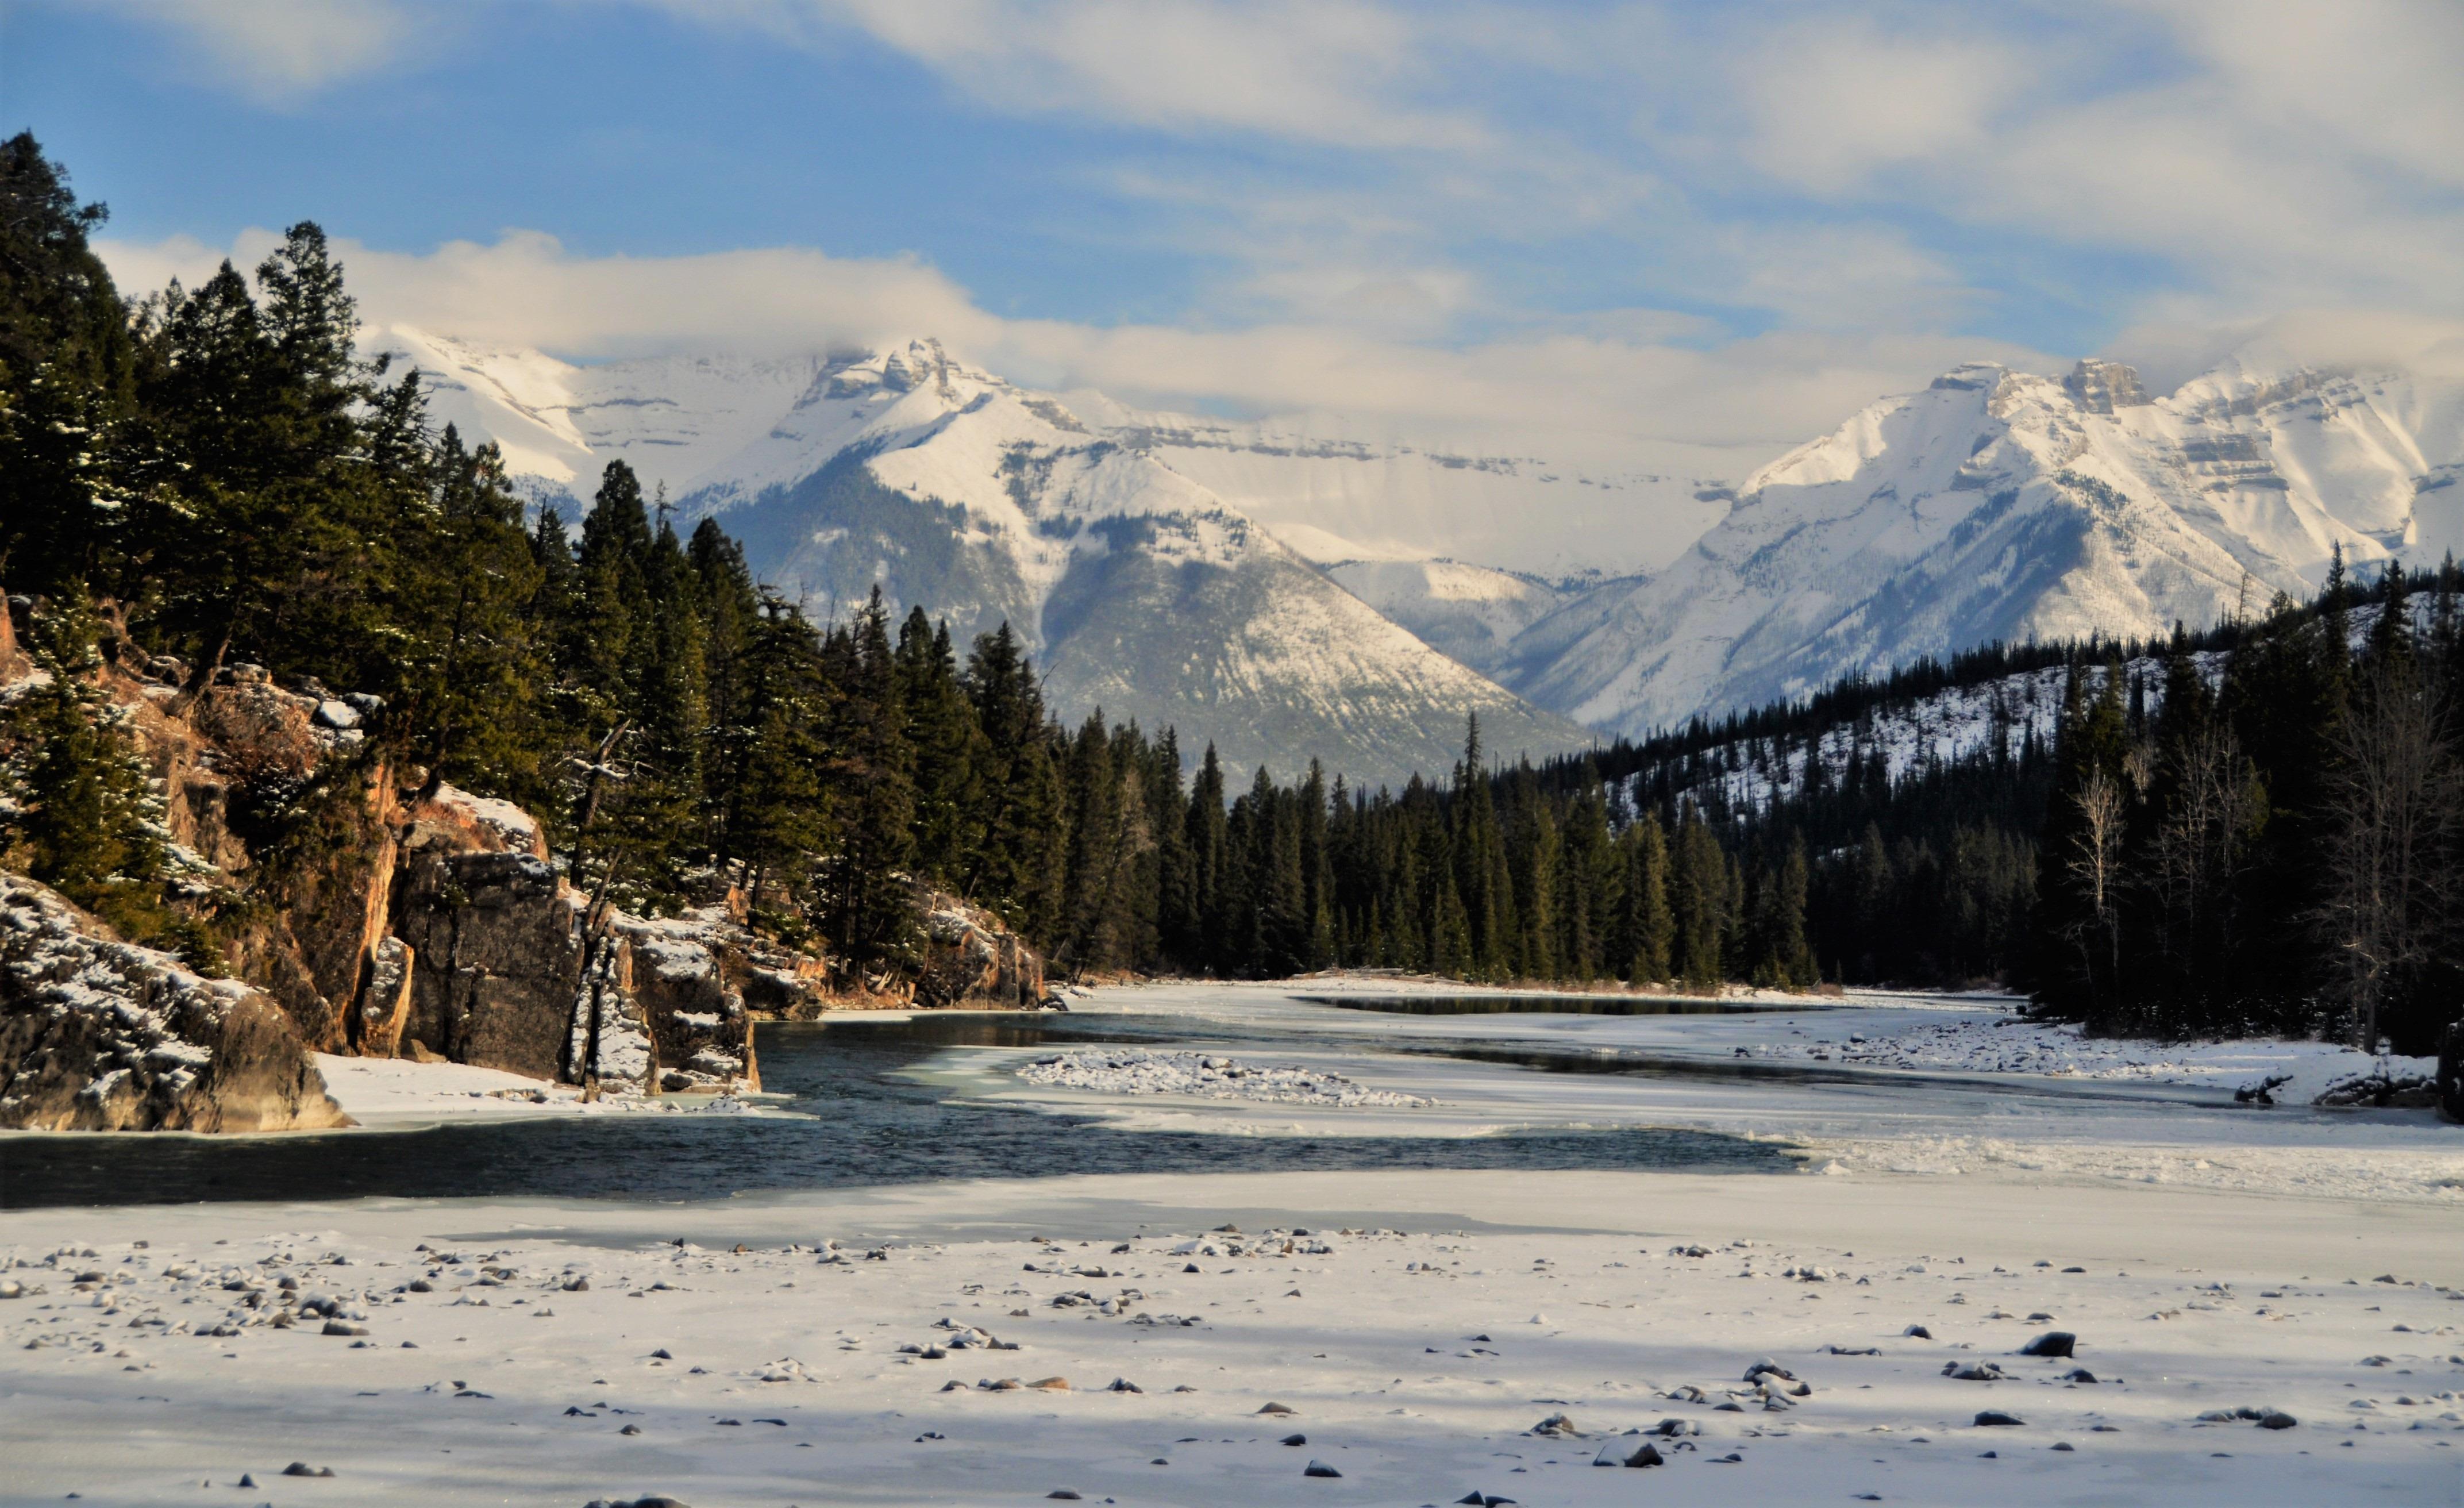 Bow River near Banff Alberta, Nov. 8-2017 - bruce witzel photo